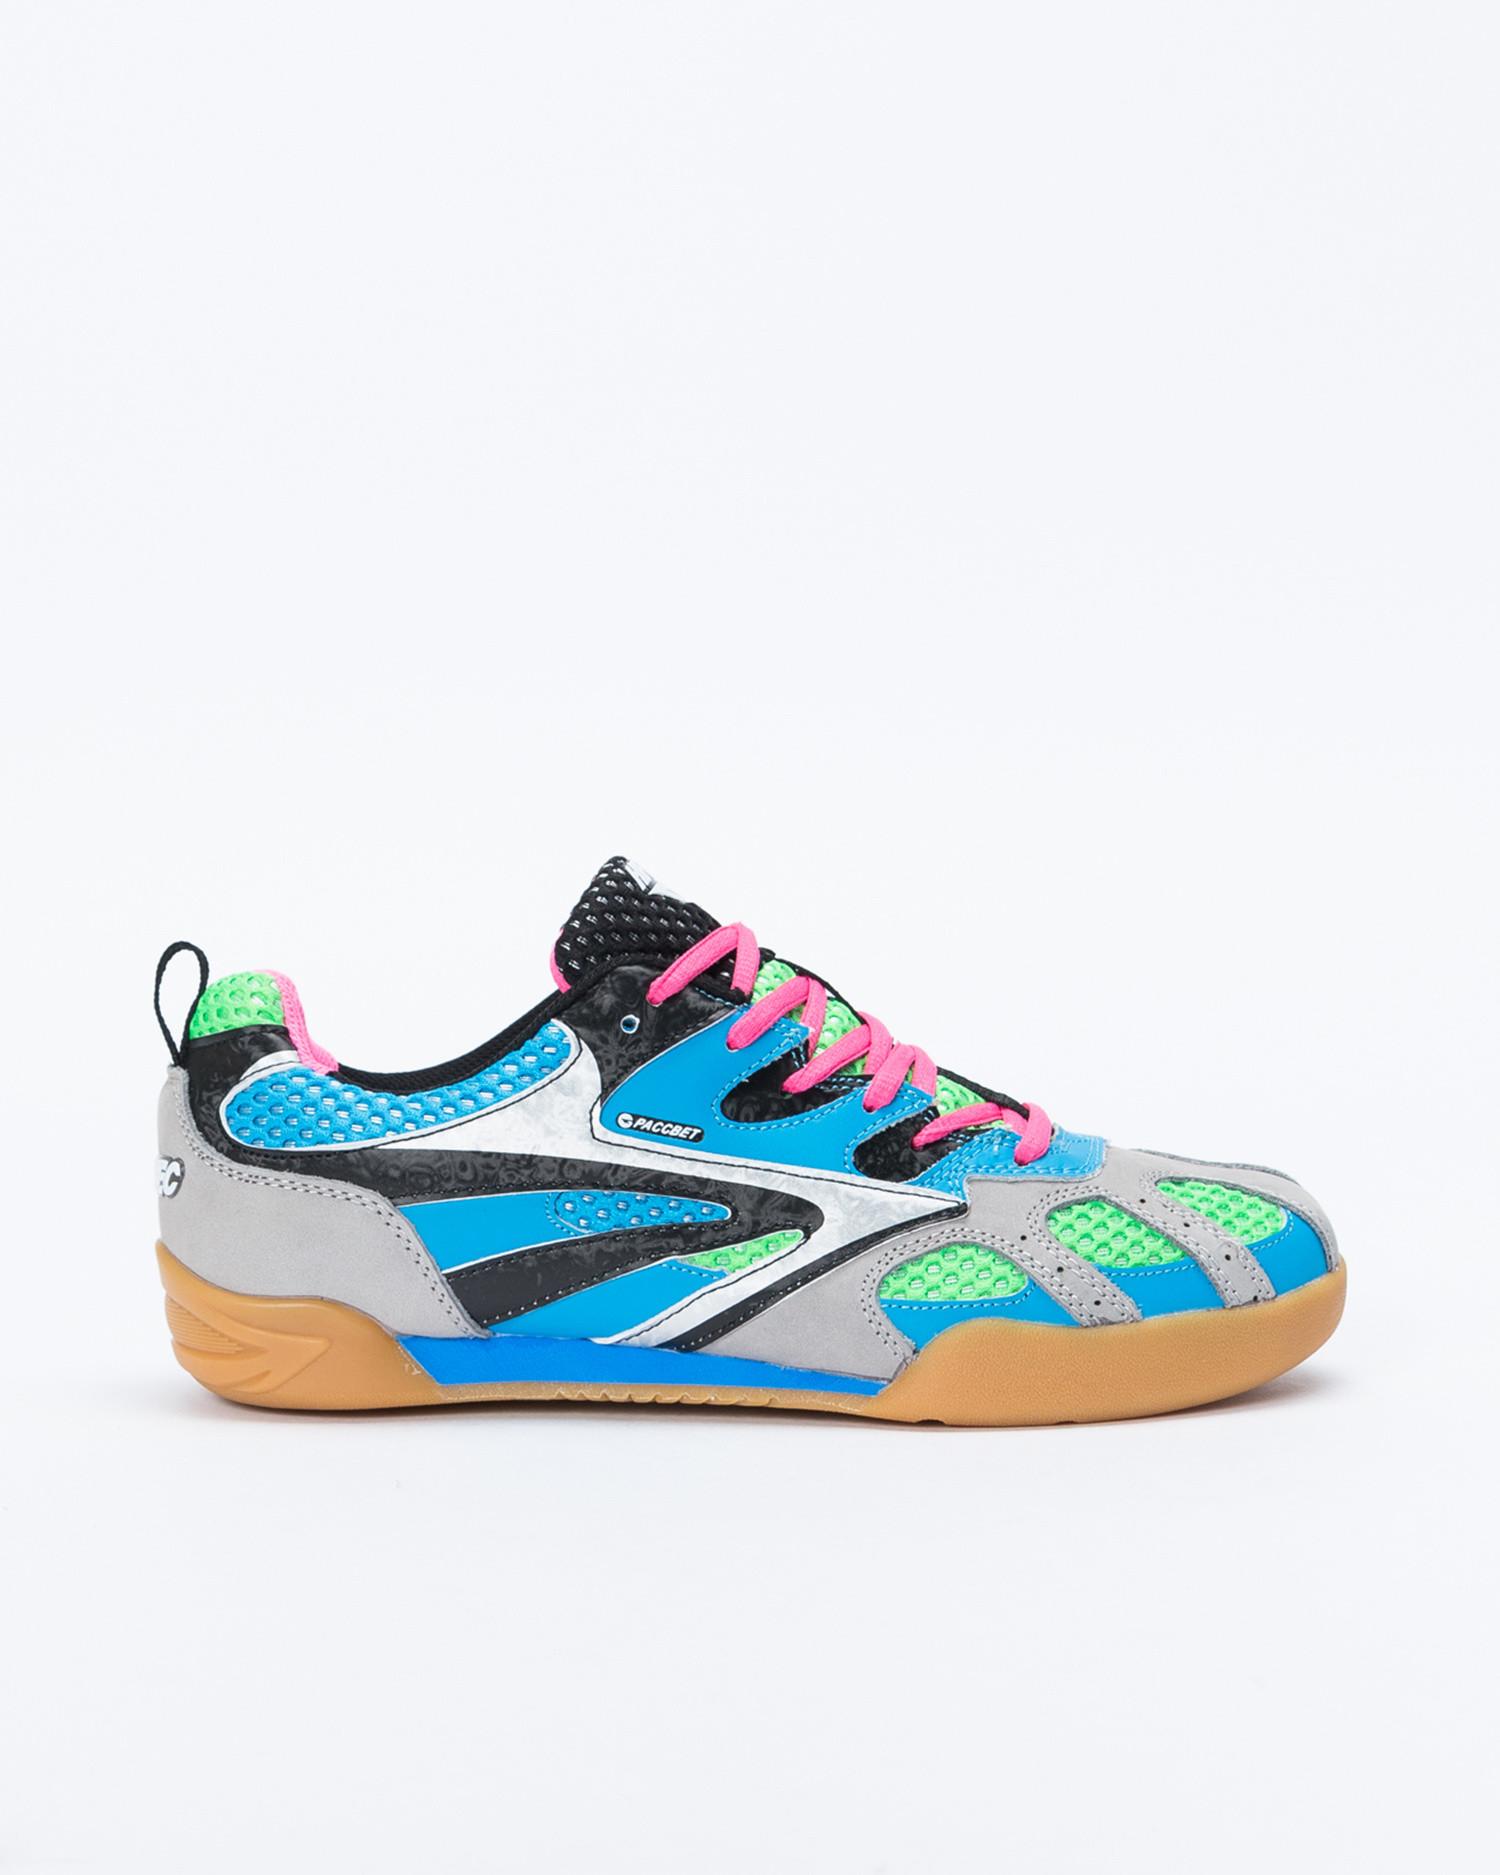 Paccbet X Hi Tech Hybrid Squash Shoe Blue